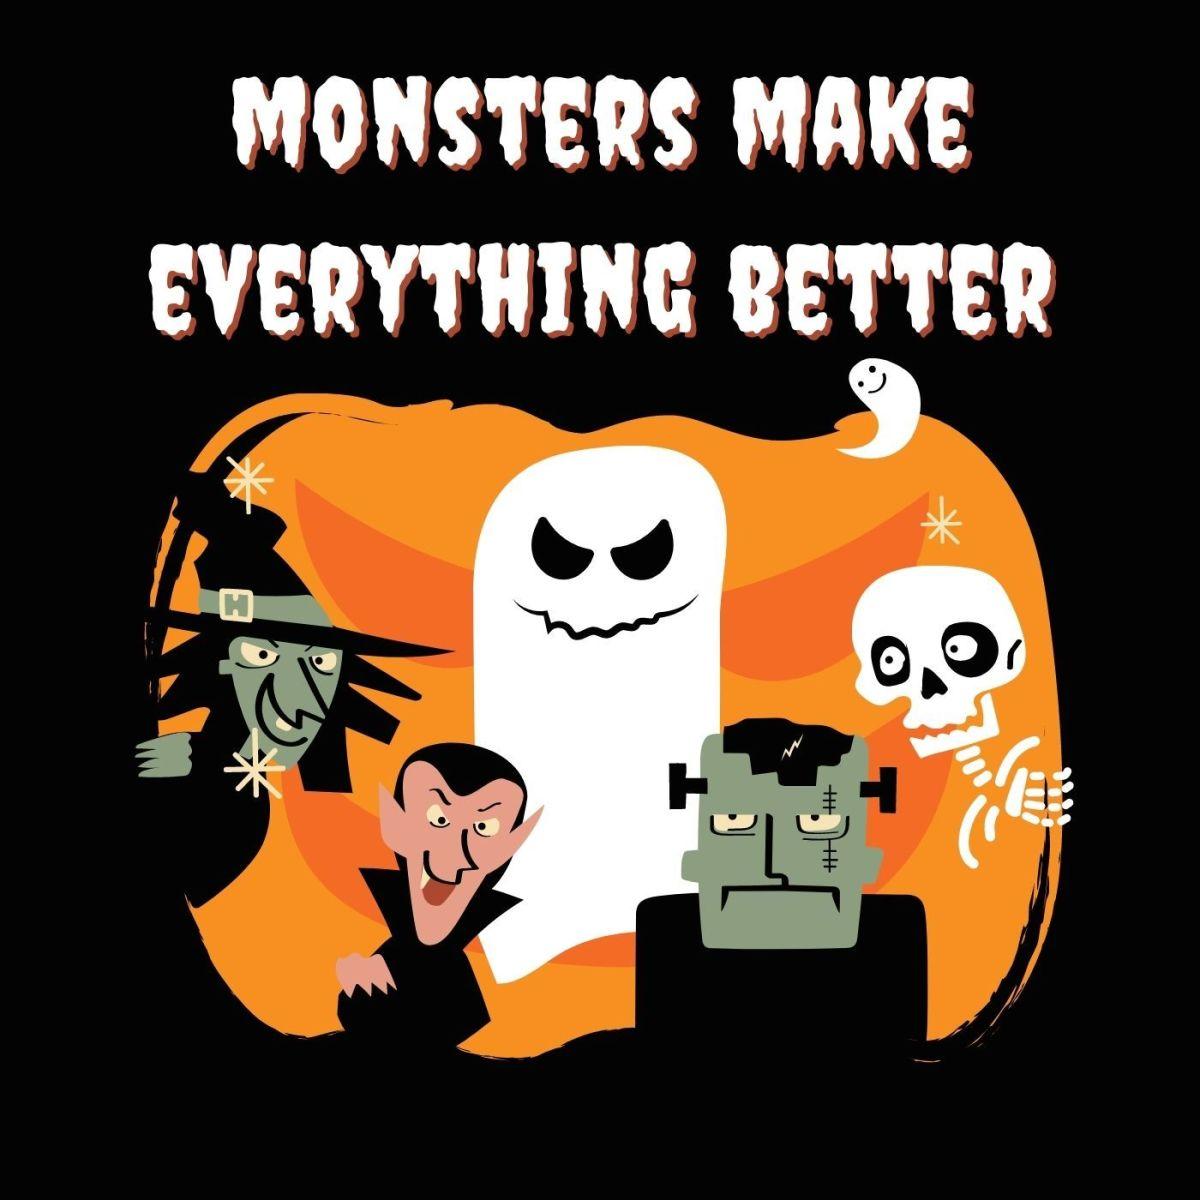 Monsters make everything better!